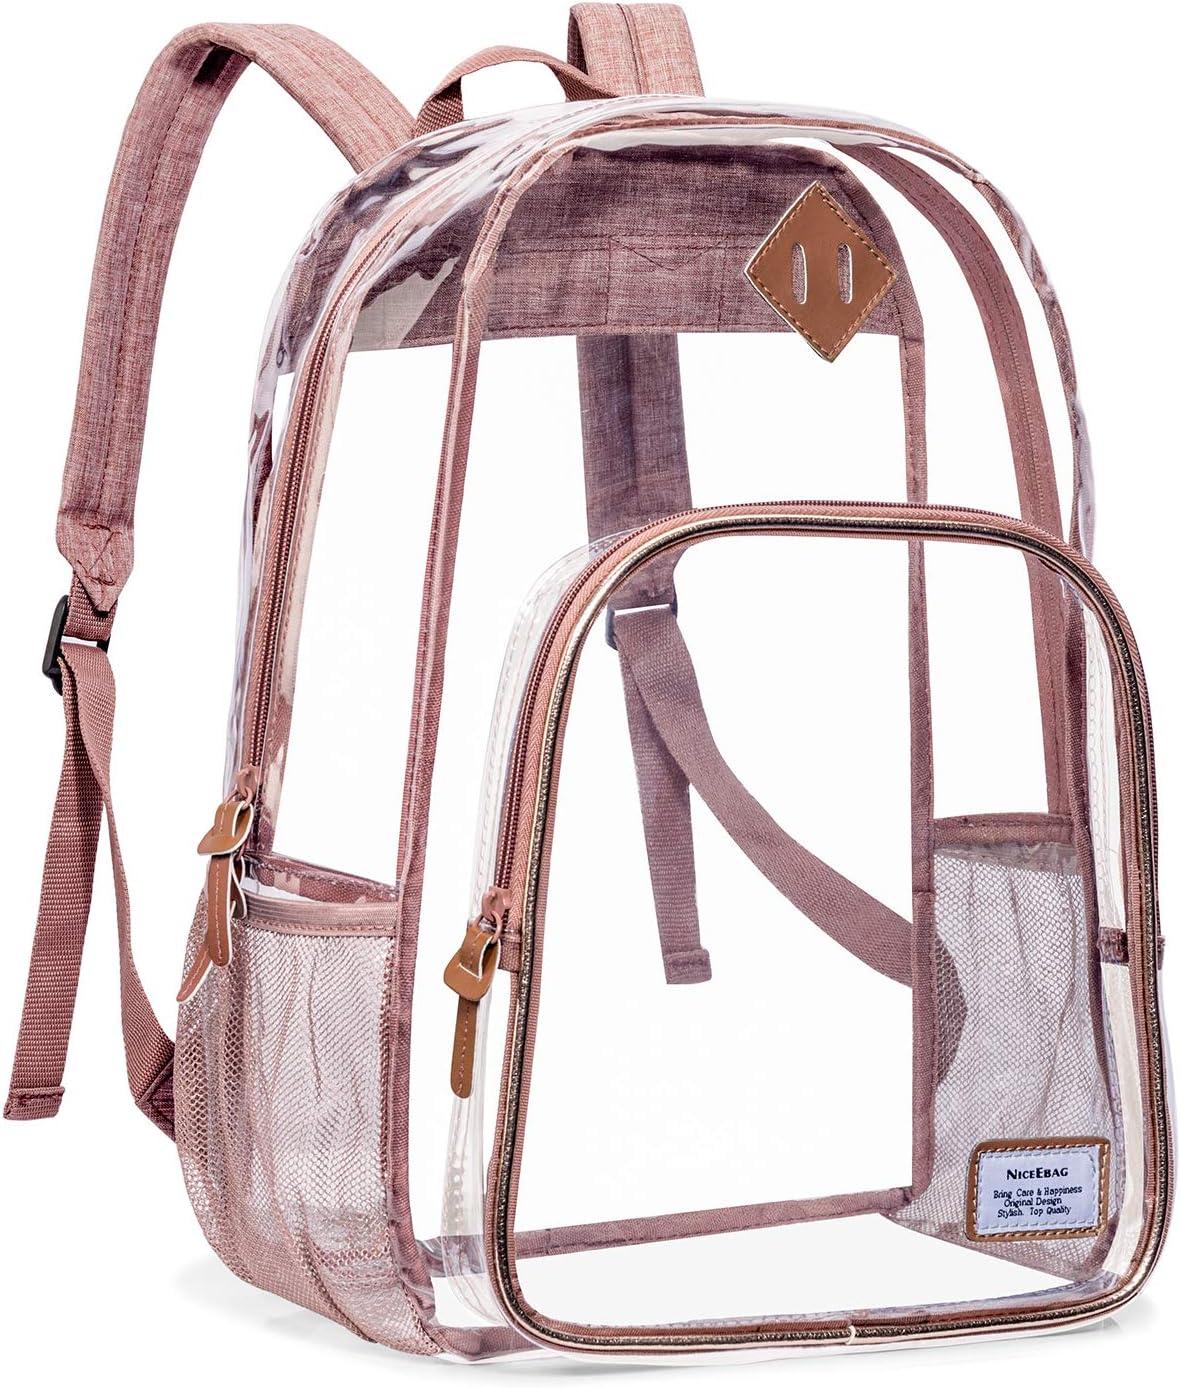 NiceEbag Clear free Backpack Heavy Duty See Genuine Free Shipping Throu Bookbag Large